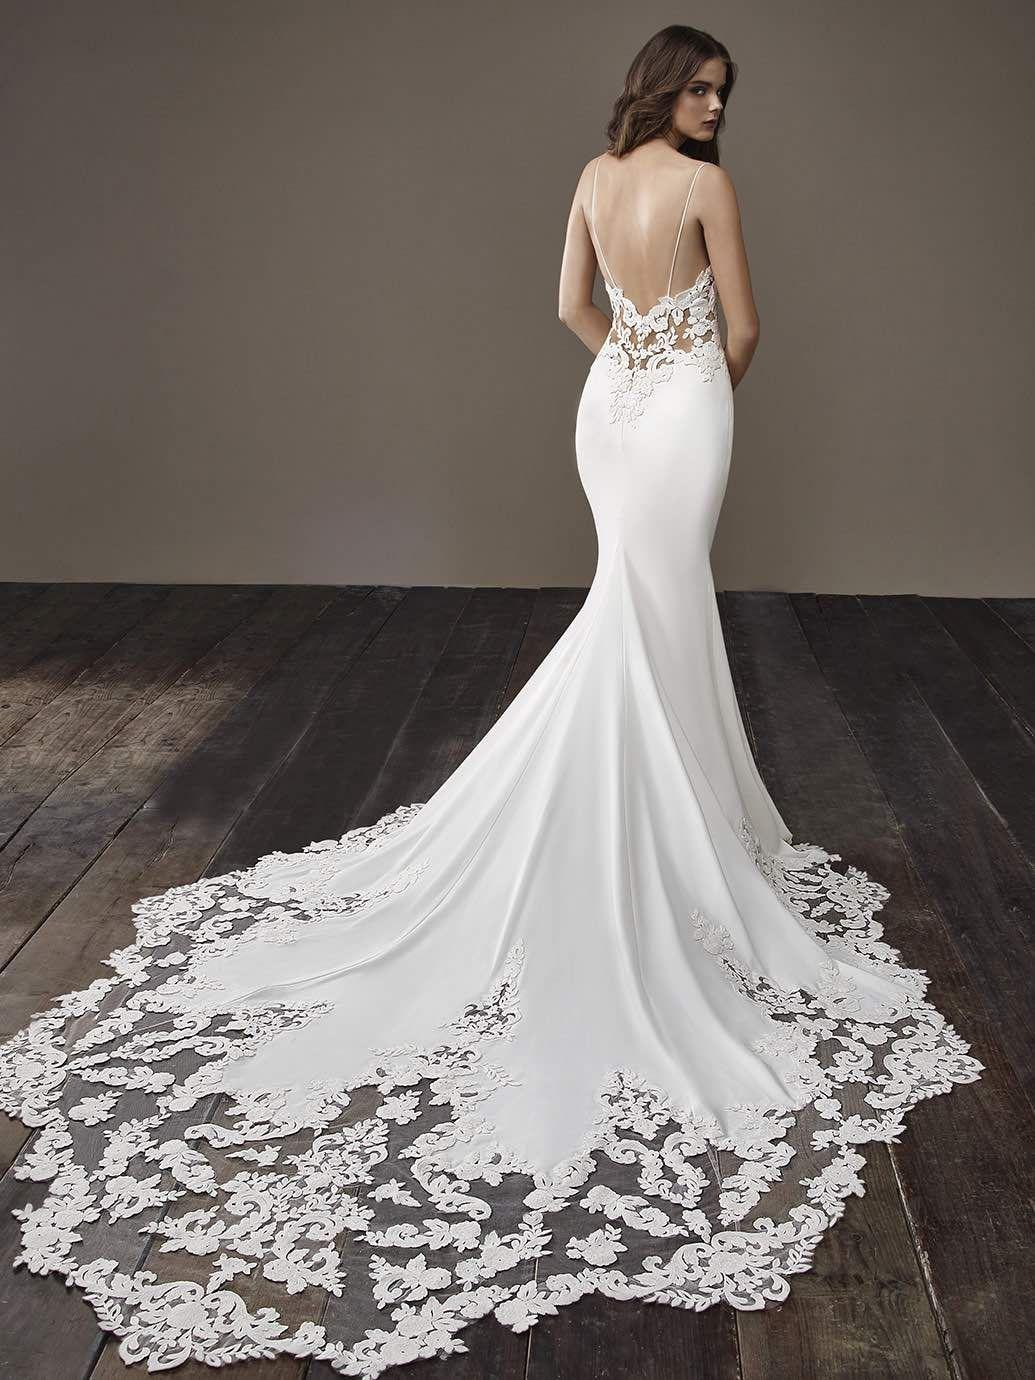 G 104 Collection No Vi Bridal Dresses Galia Lahav Wedding Dress Low Back Mermaid Wedding Dress Dream Wedding Dress Lace [ 1536 x 1024 Pixel ]